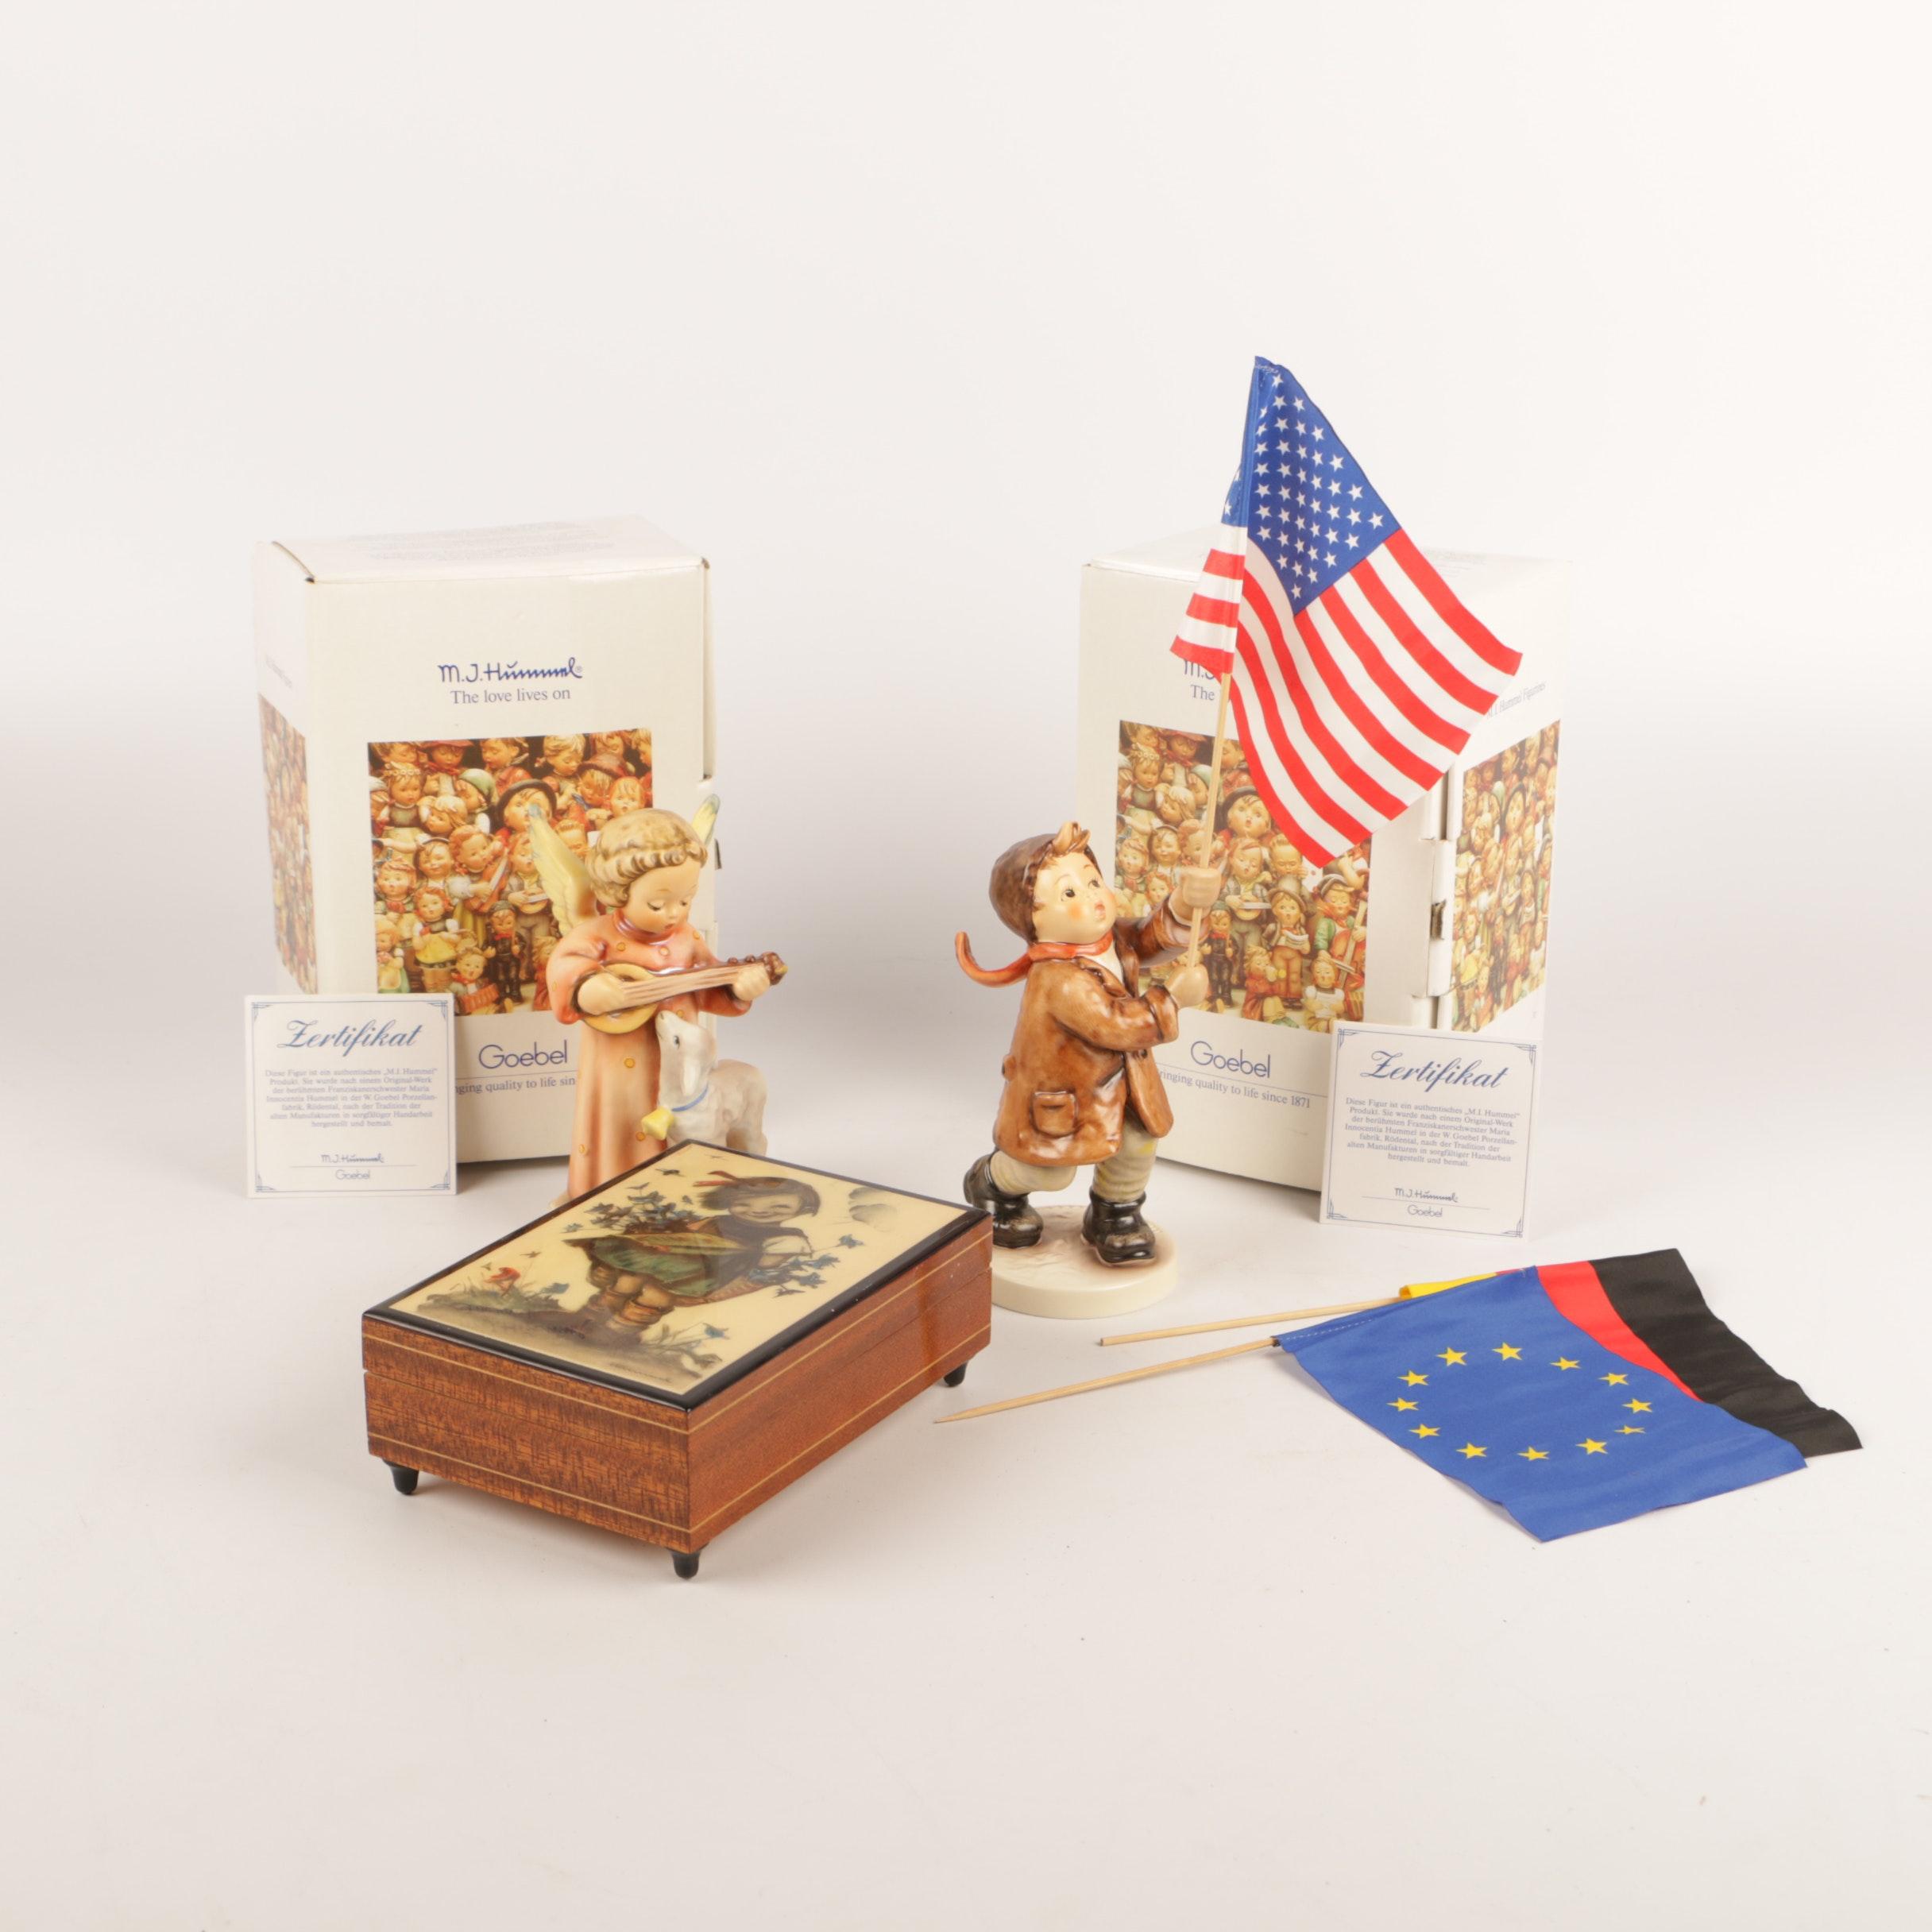 Goebel M.I.Hummel Porcelain Figurines and Reuge Music Box